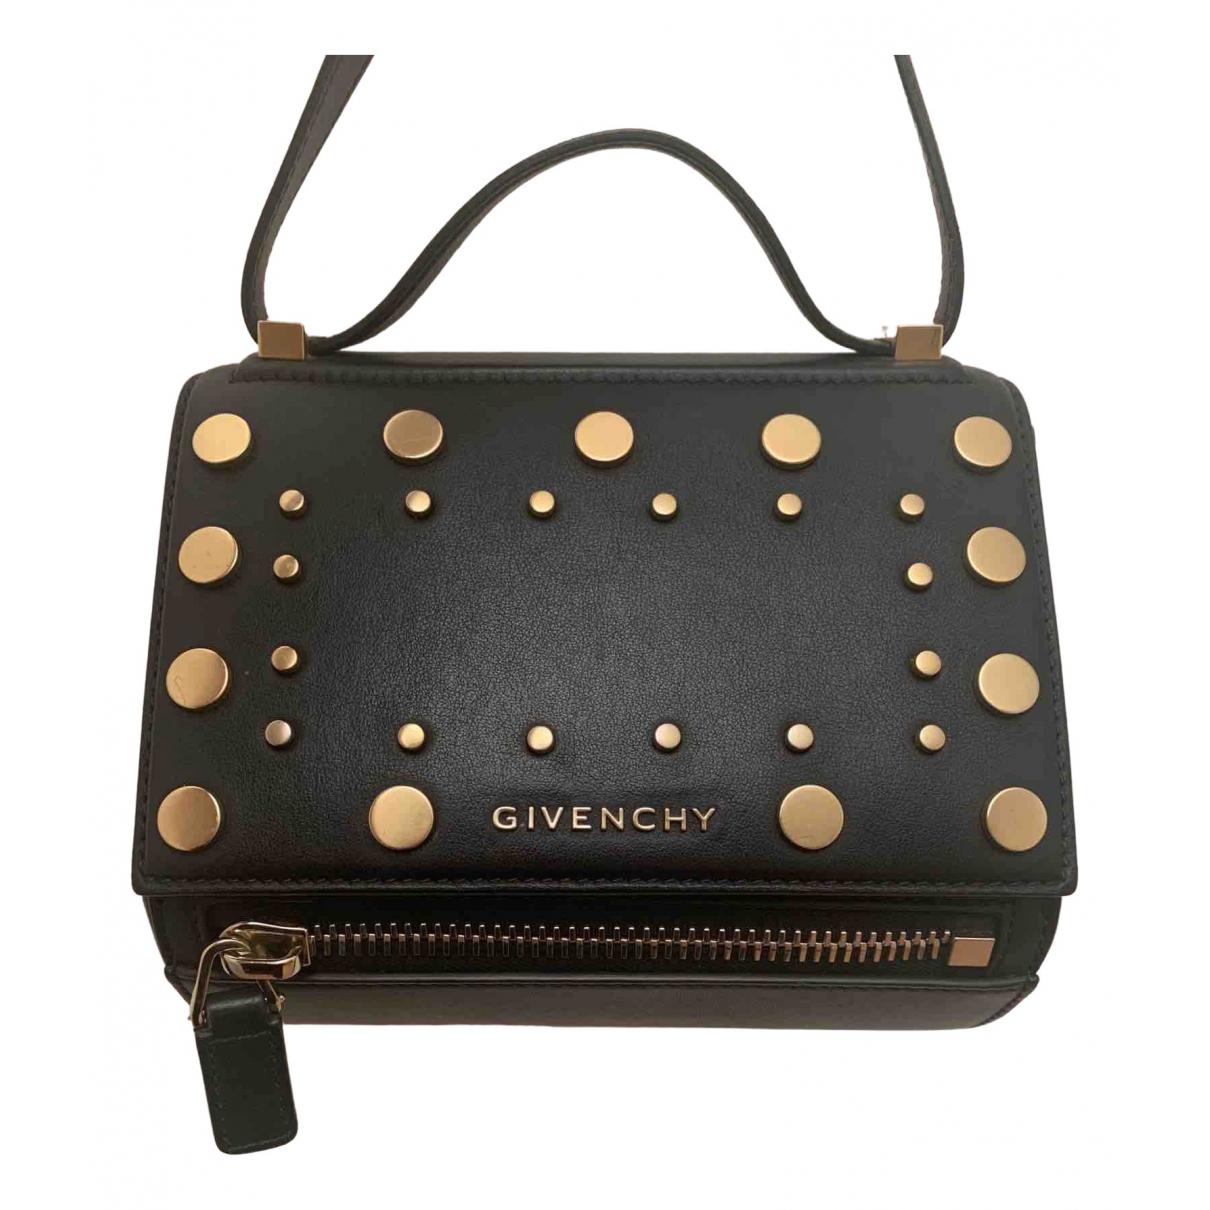 Givenchy - Sac a main Pandora Box pour femme en cuir - noir